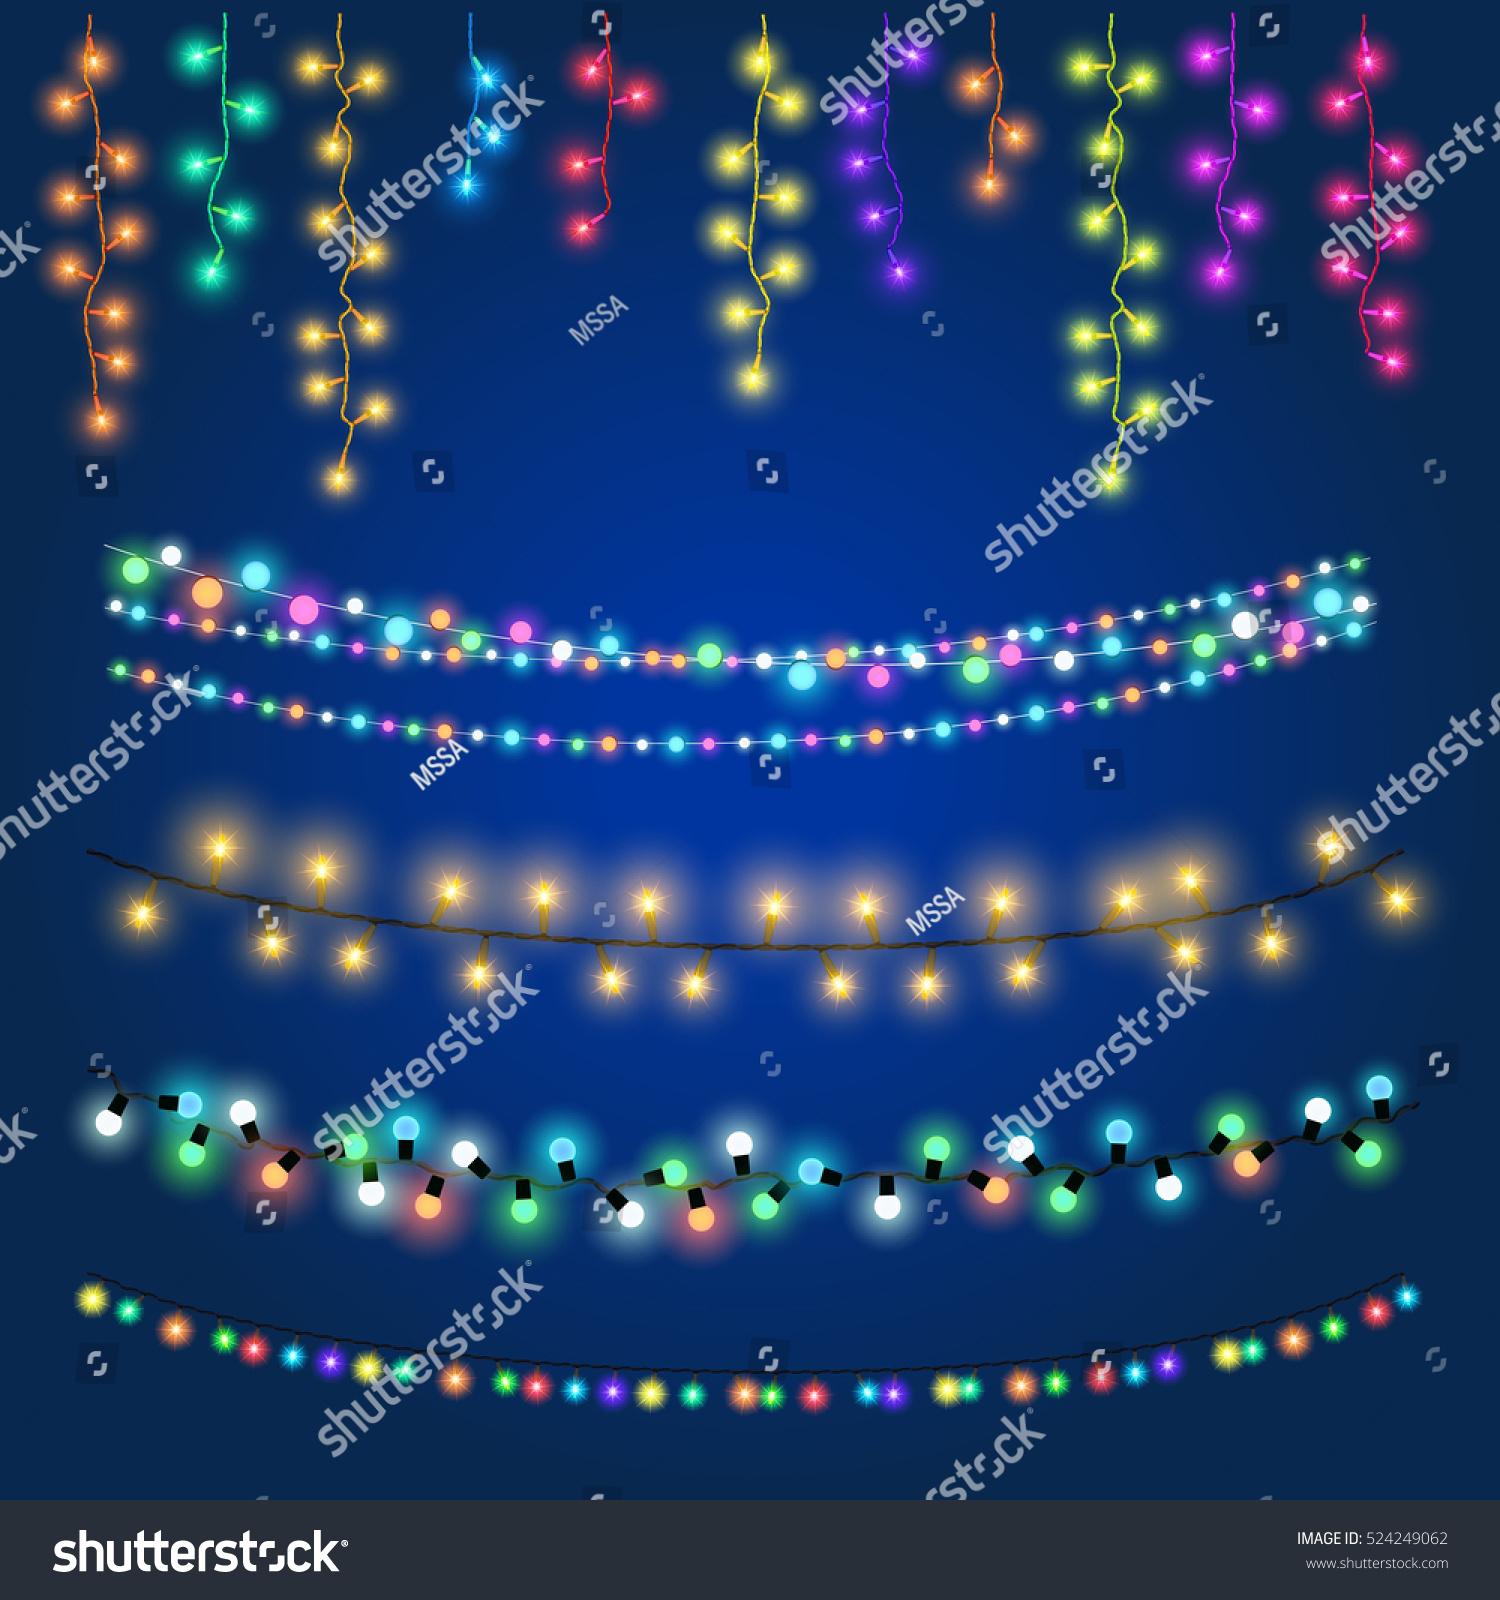 Christmas Room Stock Vector Image Of Illuminated: Christmas Fairy Hanging Lights Vector Illustration Stock